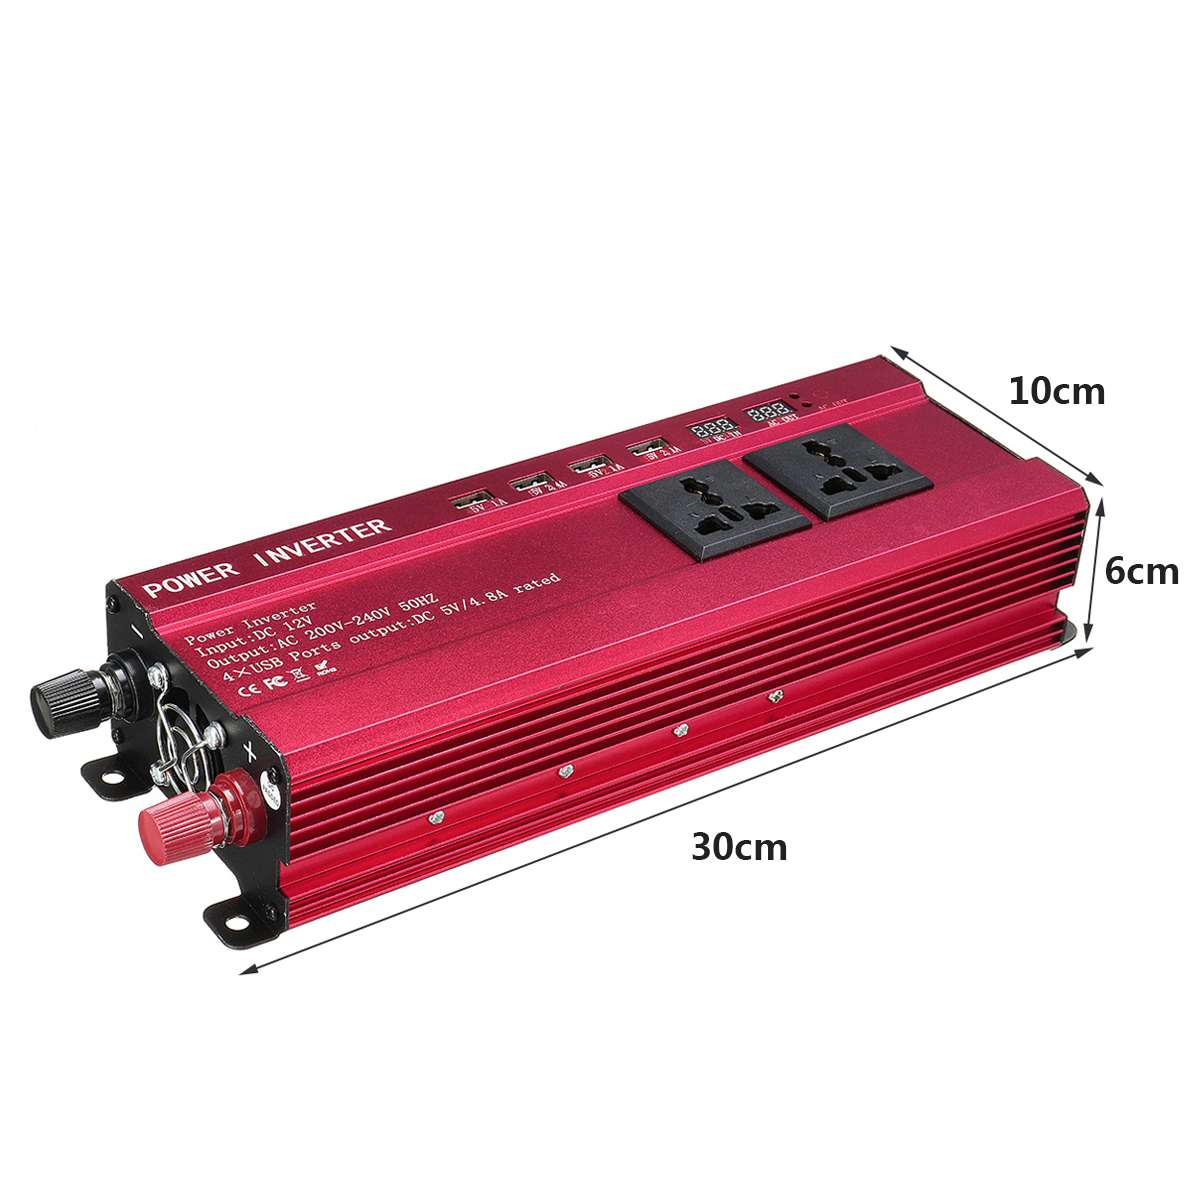 KROAK Auto Inverter DC 12V zu AC 200-240V 8000W Spannung Power Converter Digitale Display Geändert sinus Welle 4 USB Port 3 AC Outlet